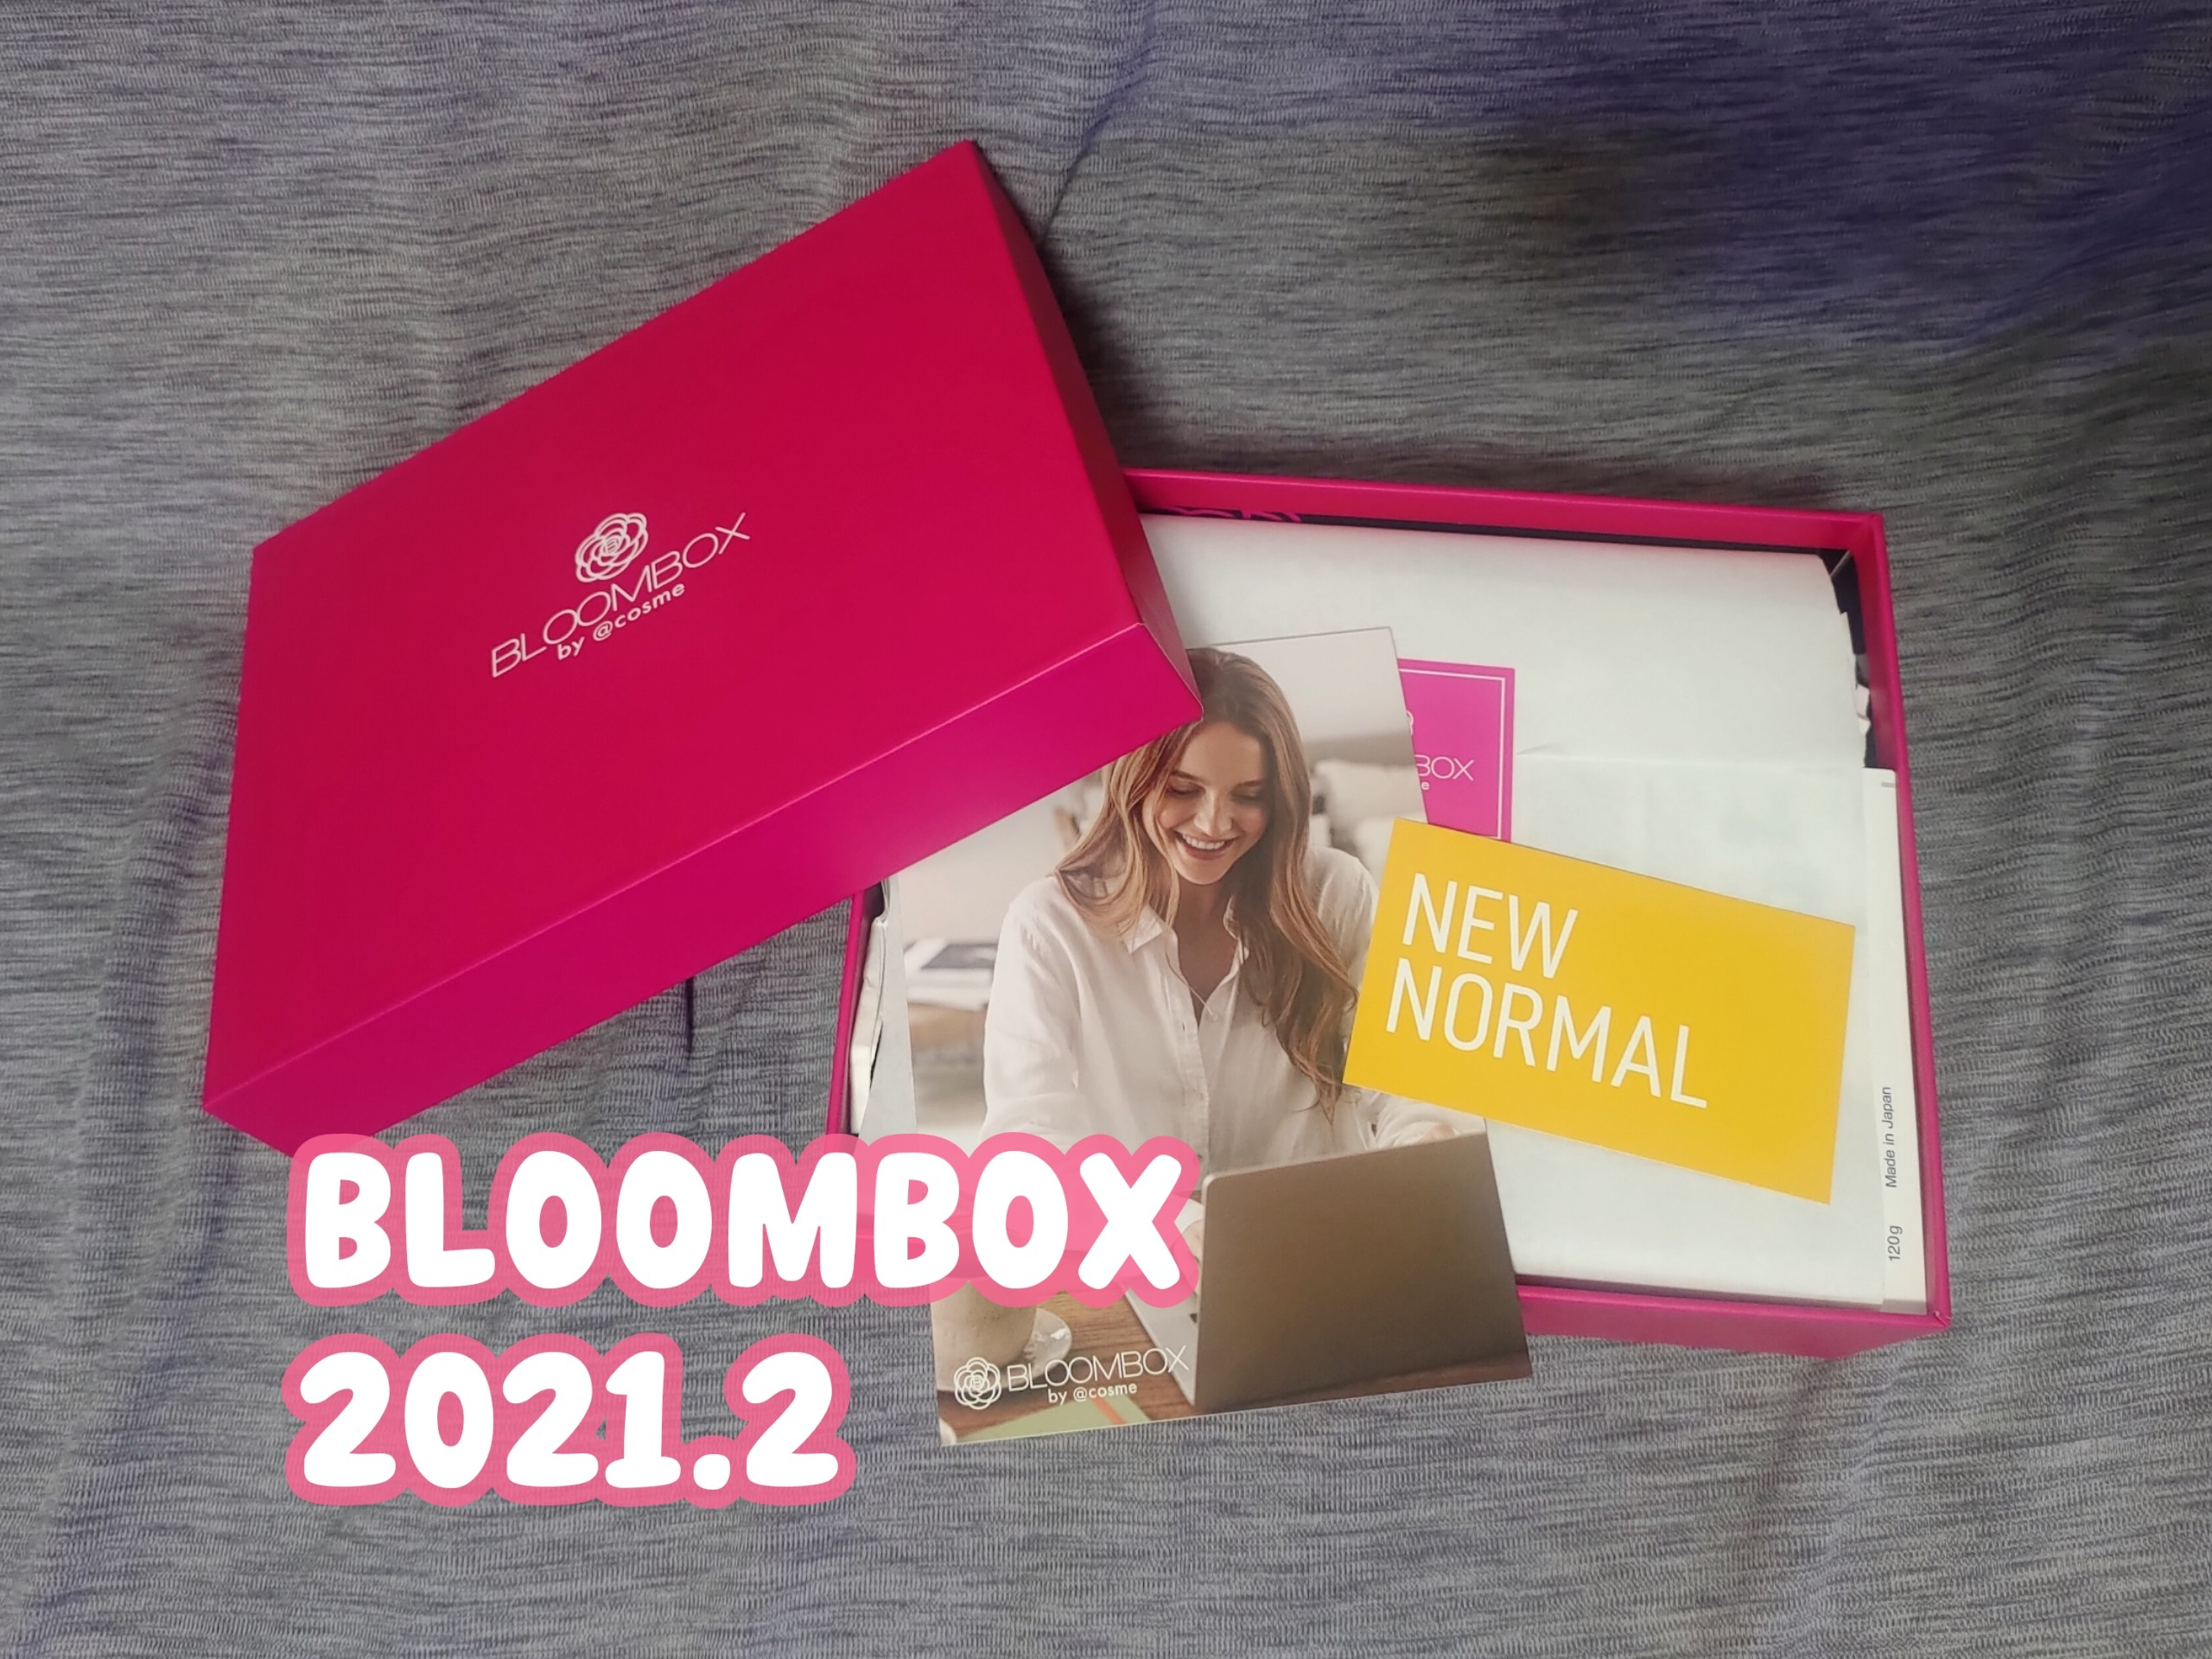 BLOOMBOX 2021年2月 中身公開【敏感肌用スキンケアとサロン専売品!】